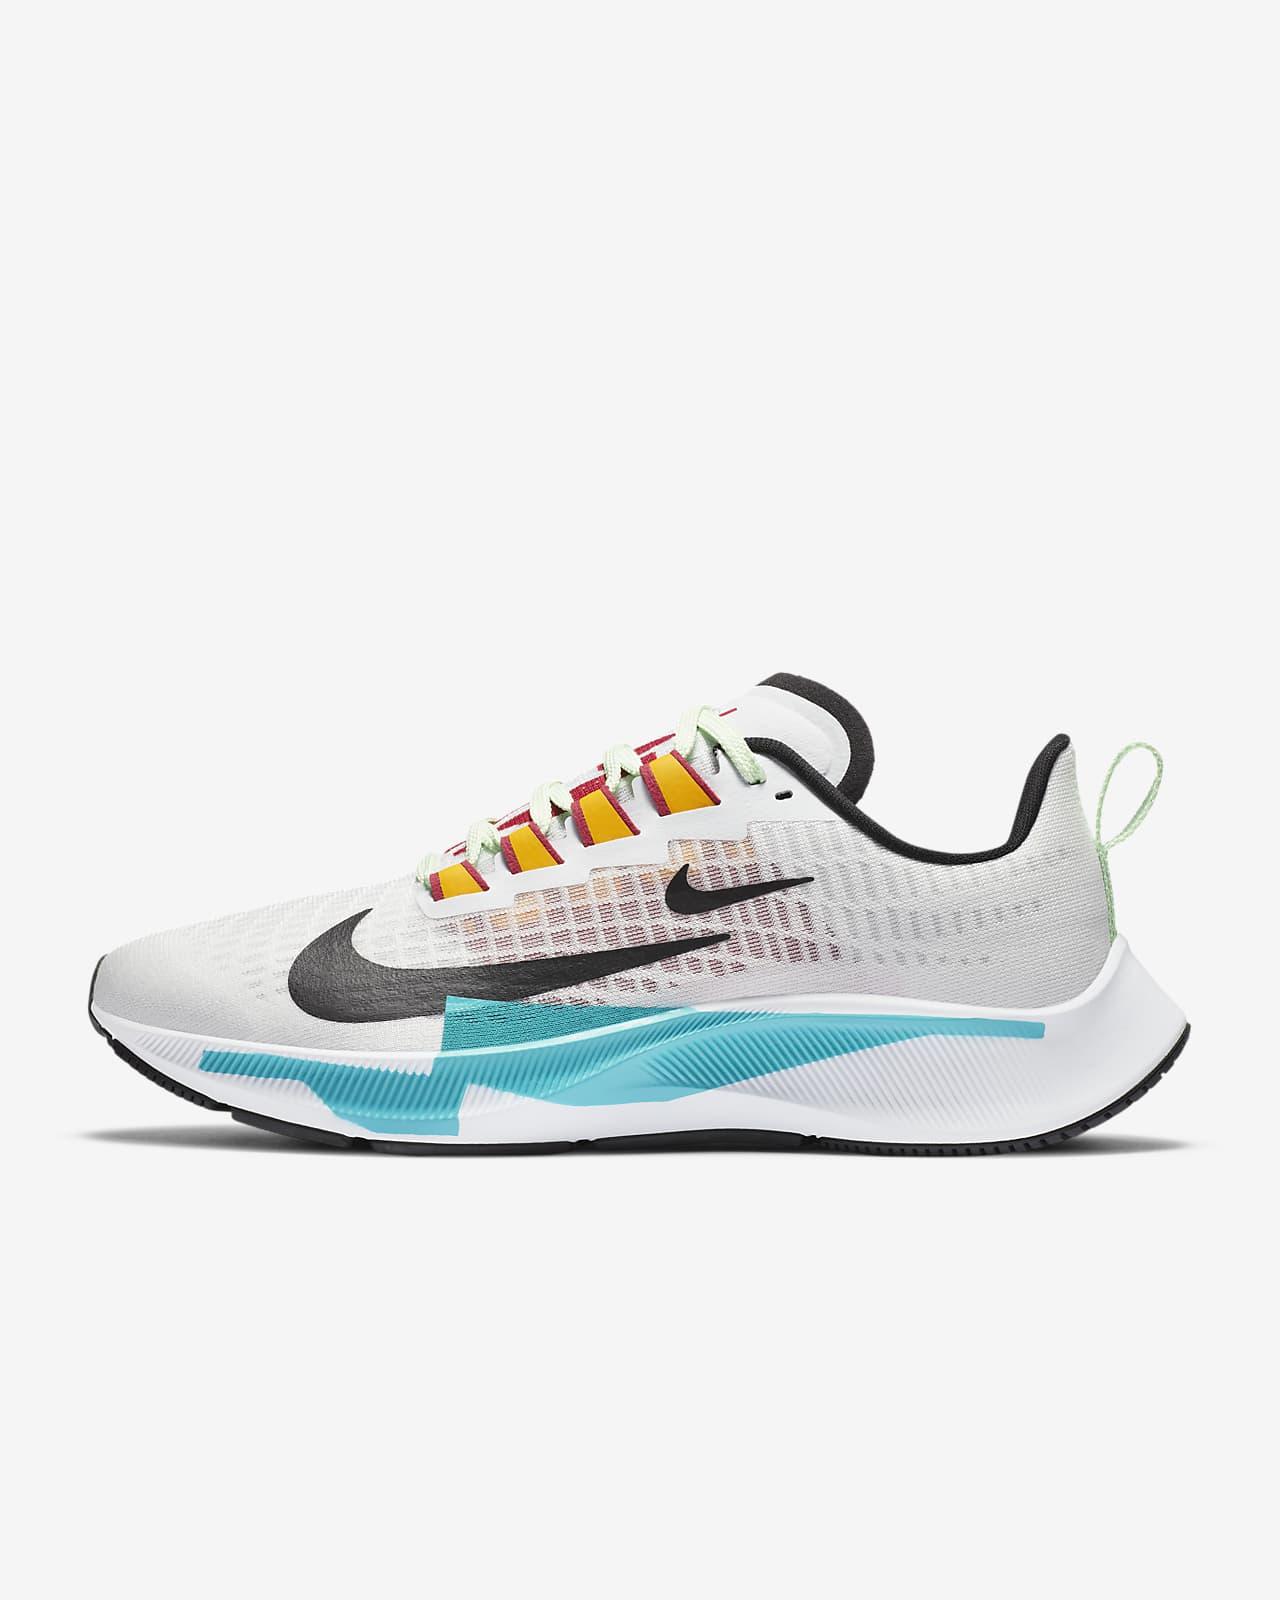 Nike Air Zoom Pegasus 37 Premium Women's Running Shoe